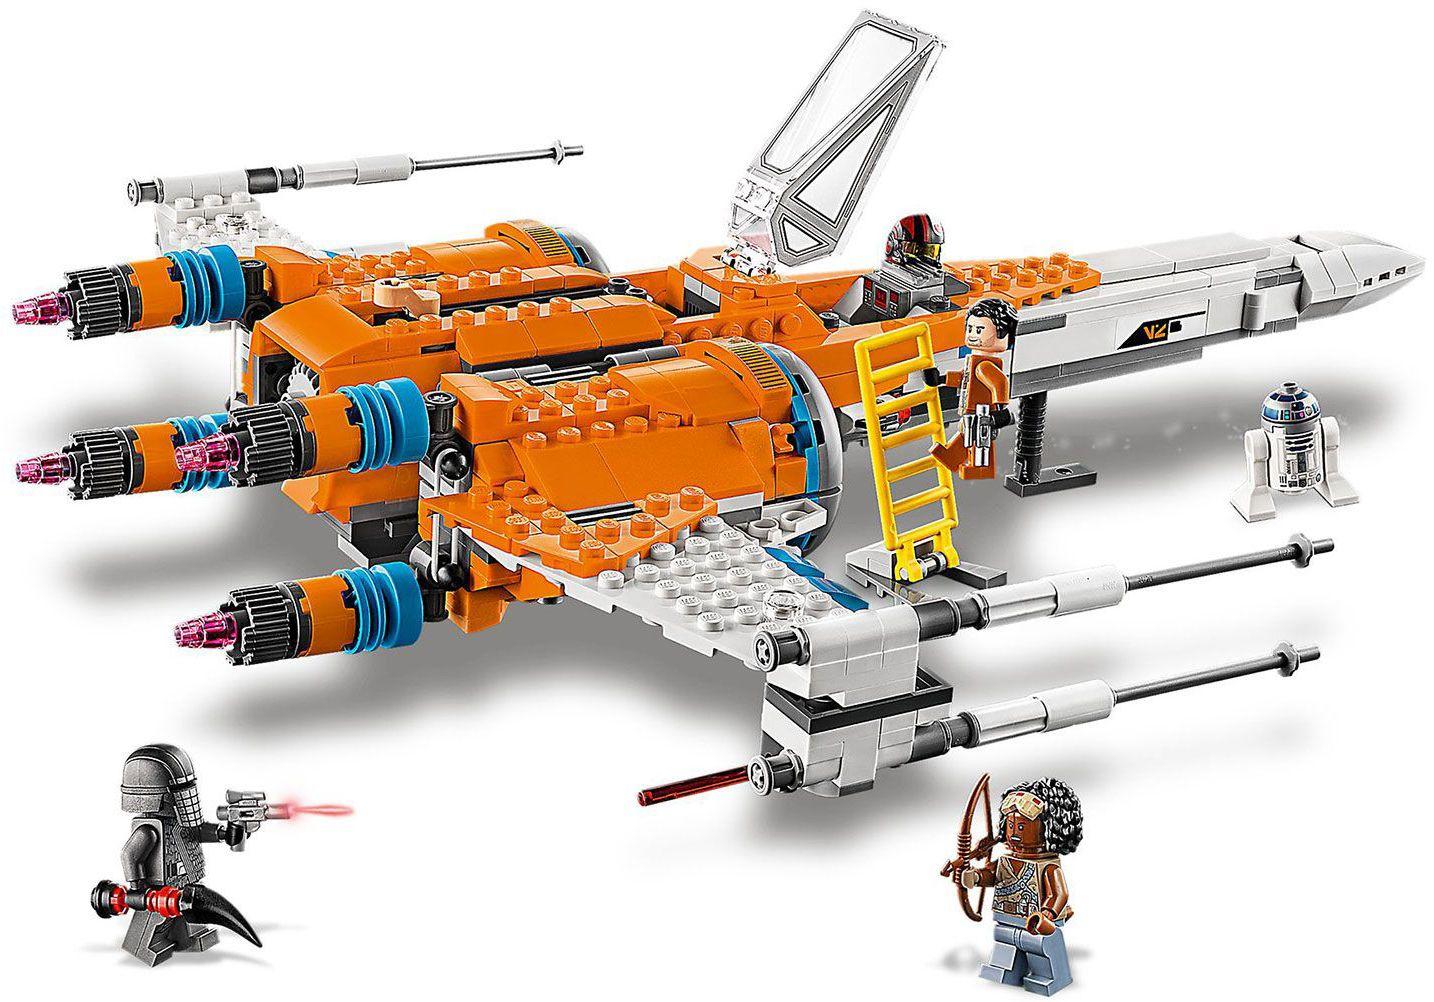 Конструктор Lego Star Wars - Poe Dameron's X-wing Fighter (75273) - 4